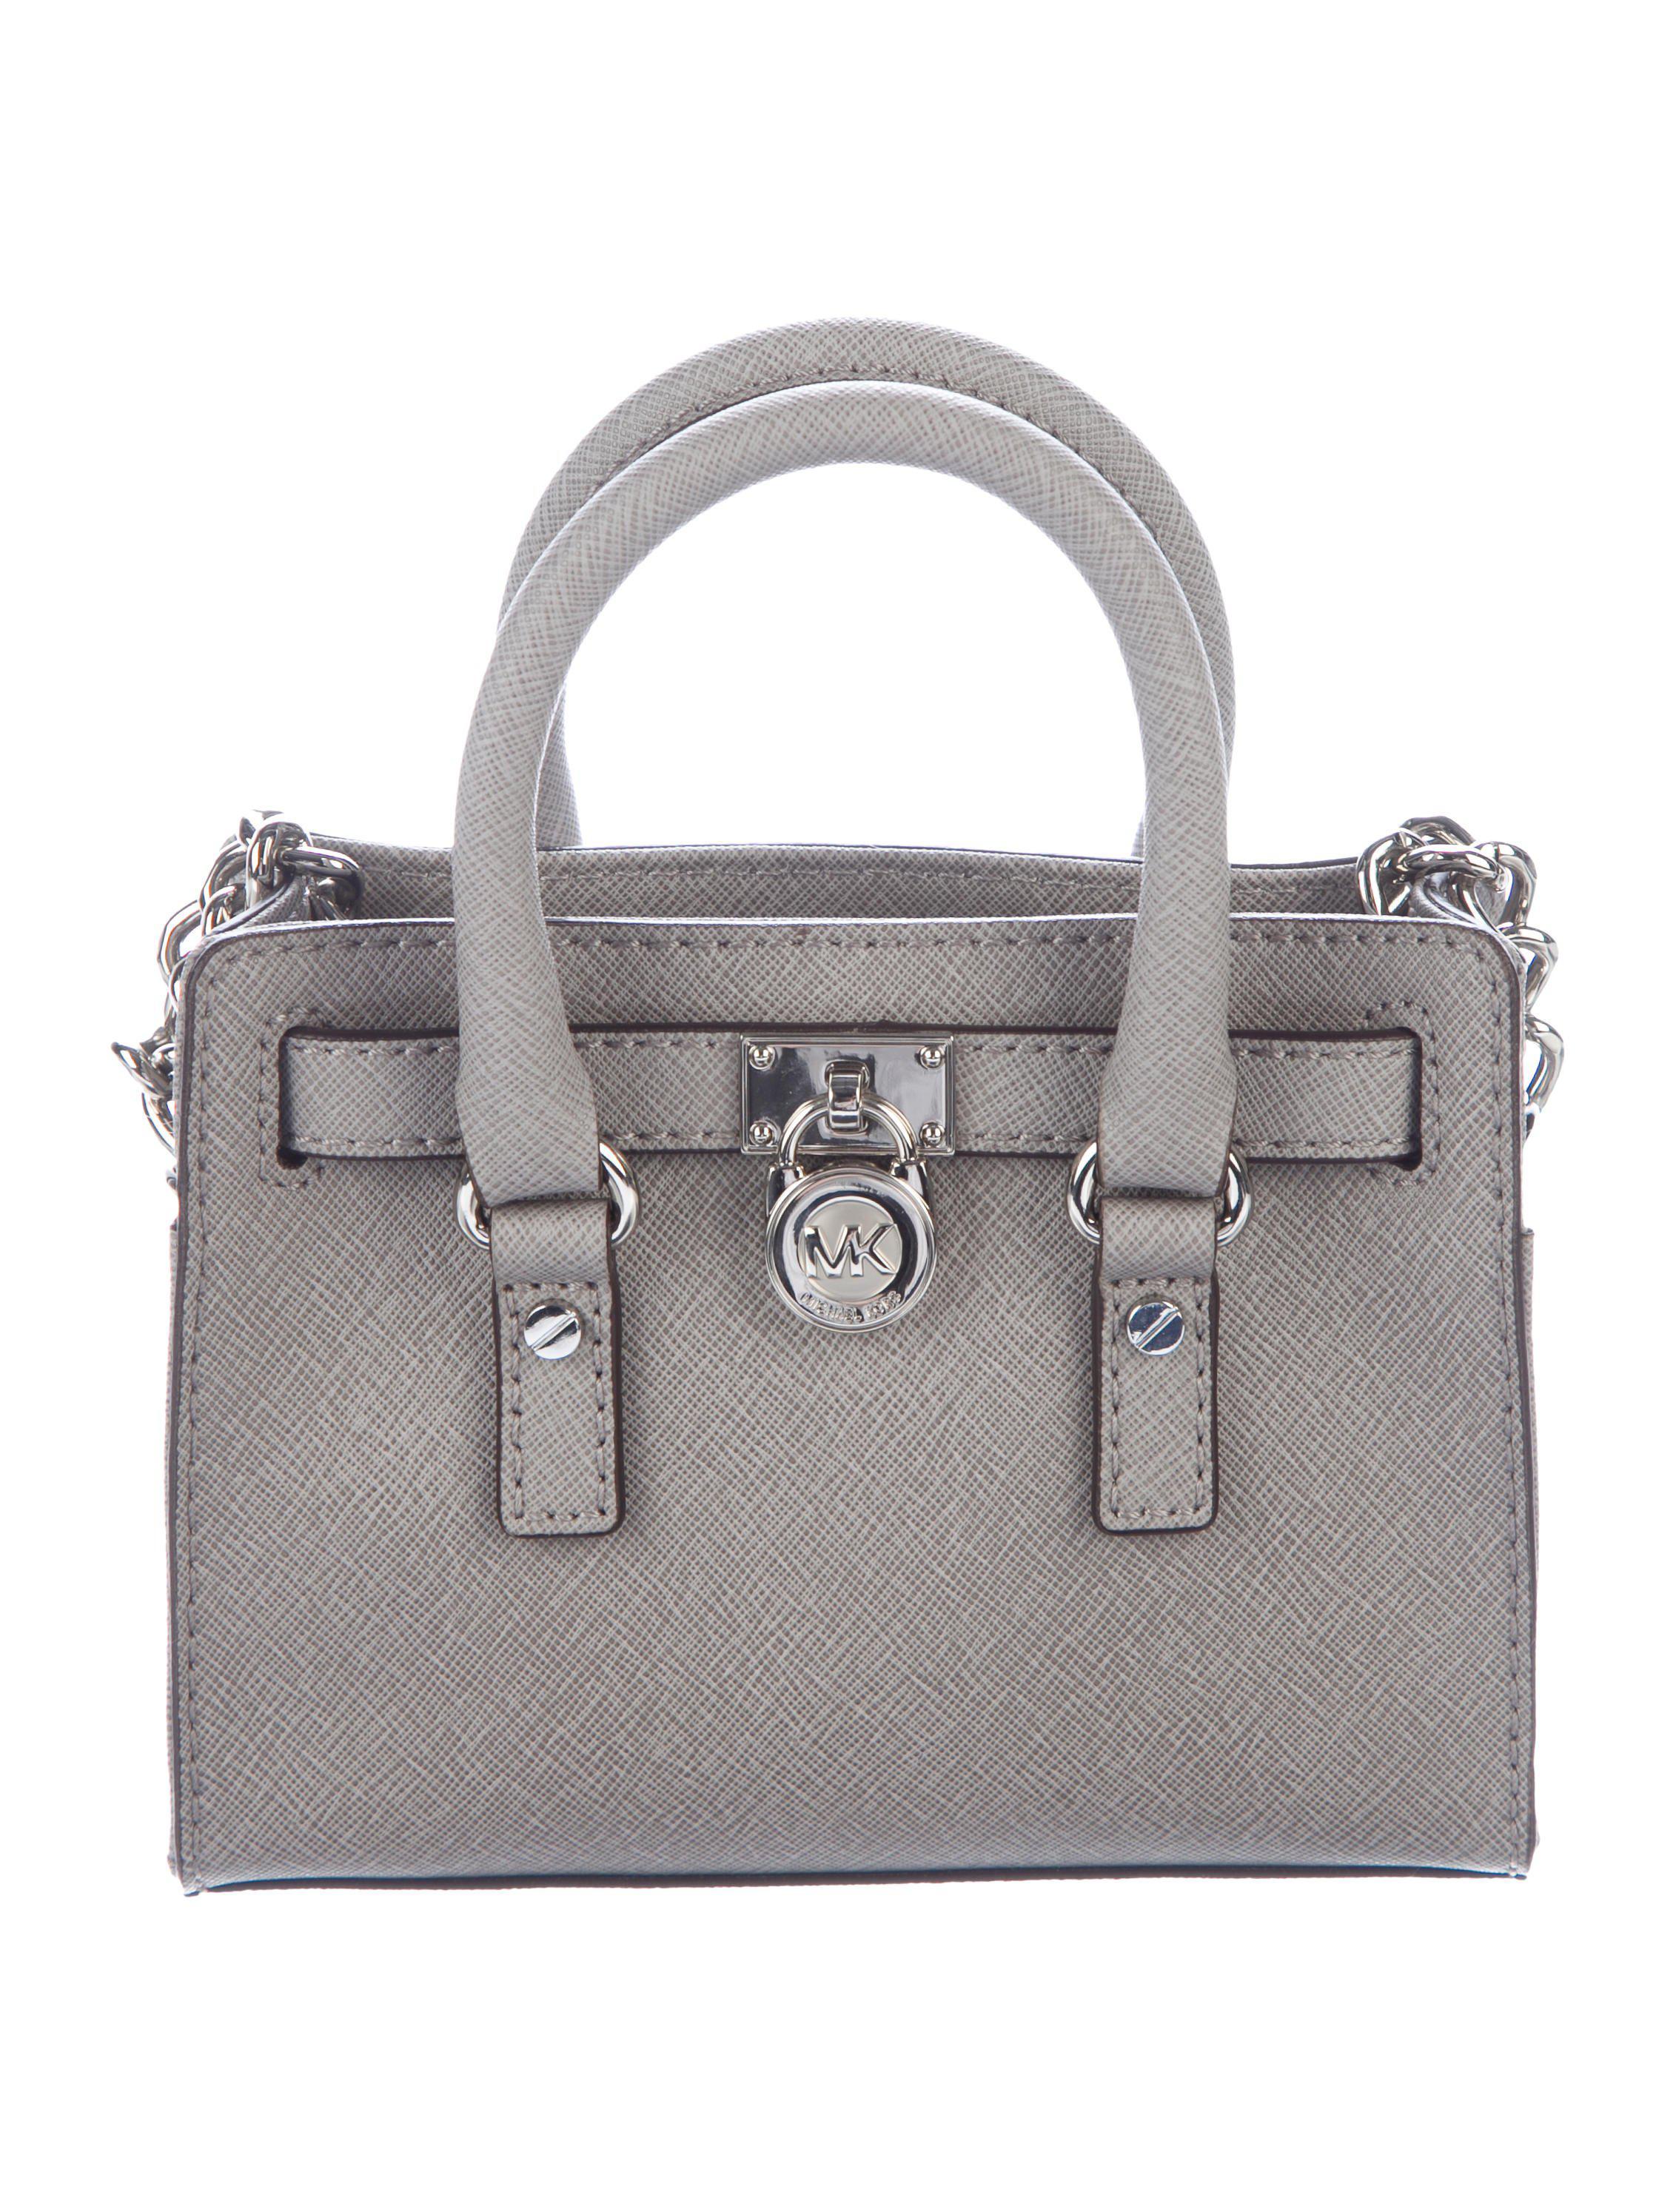 c7035168af55 ... get michael michael kors. womens metallic michael kors micro hamilton  satchel grey e4e6b 561dc